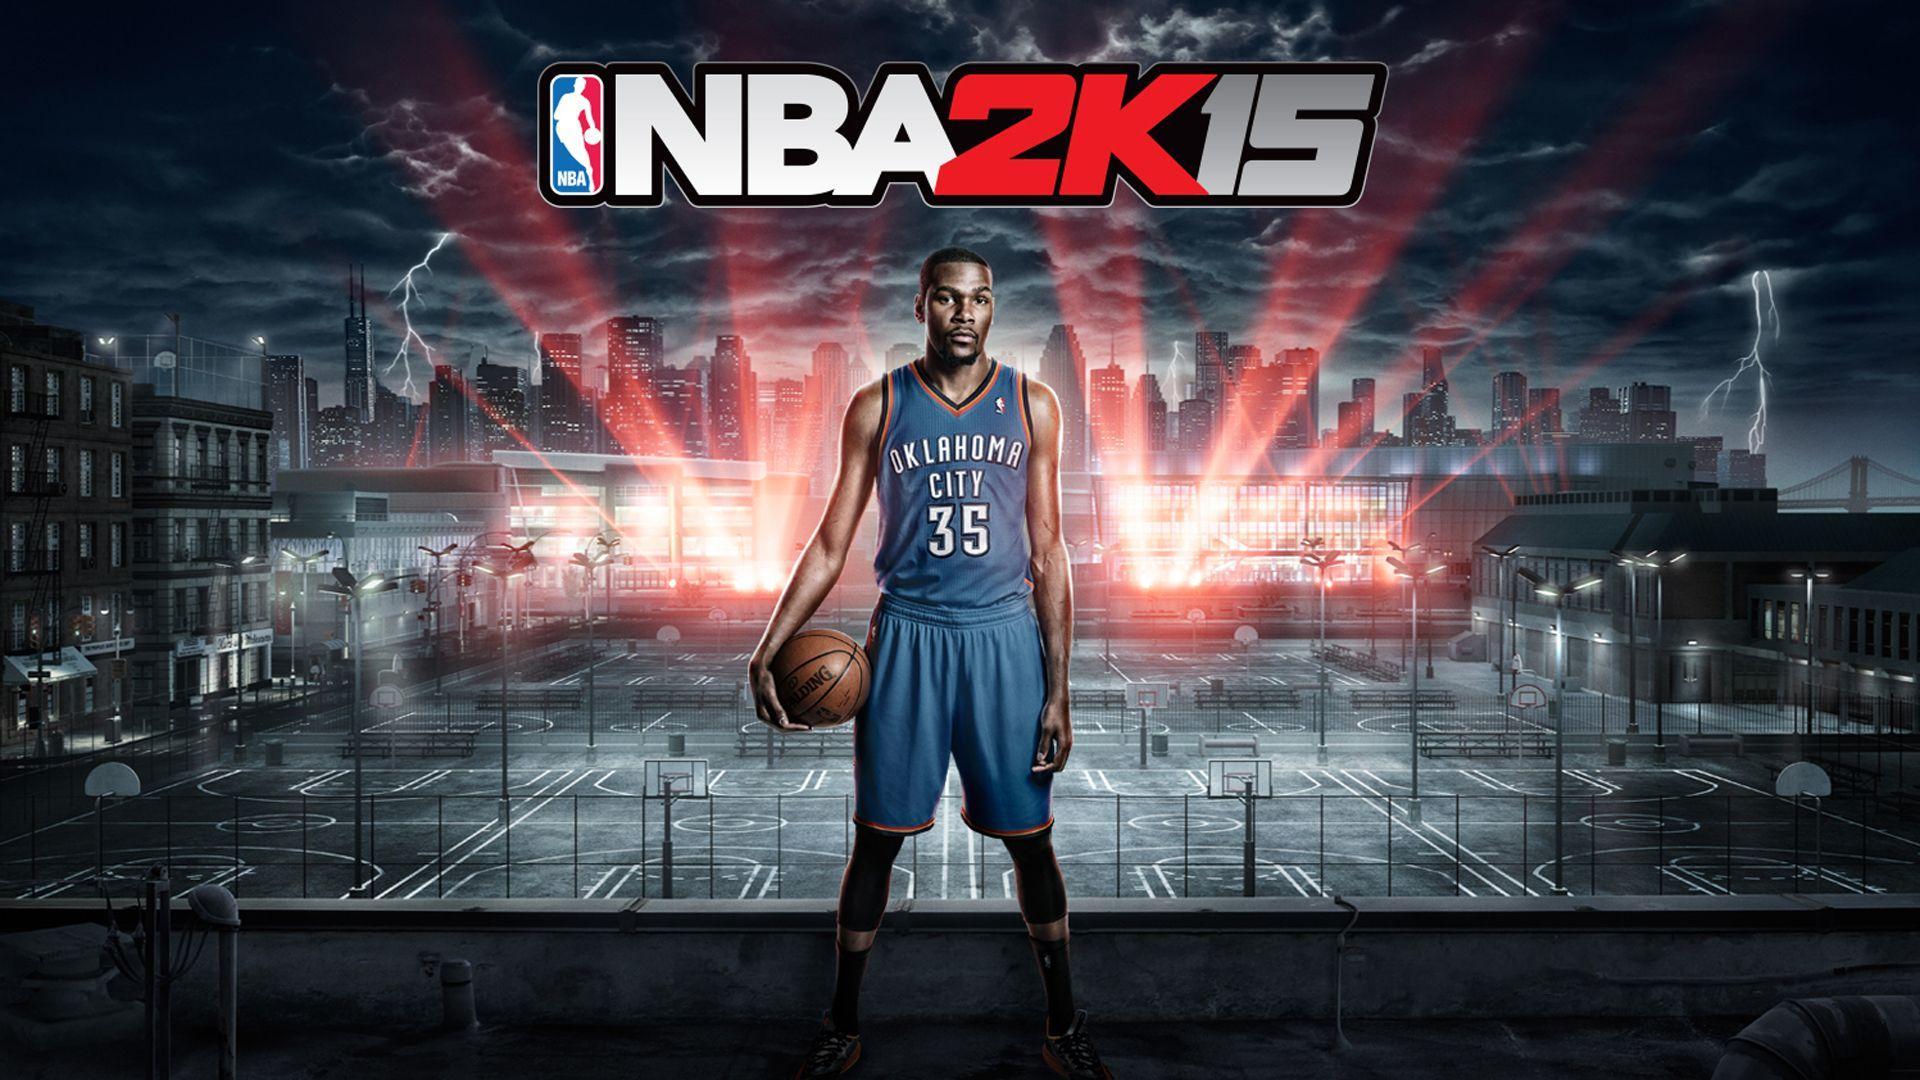 2k Hd Wallpapers: NBA 2K Wallpapers